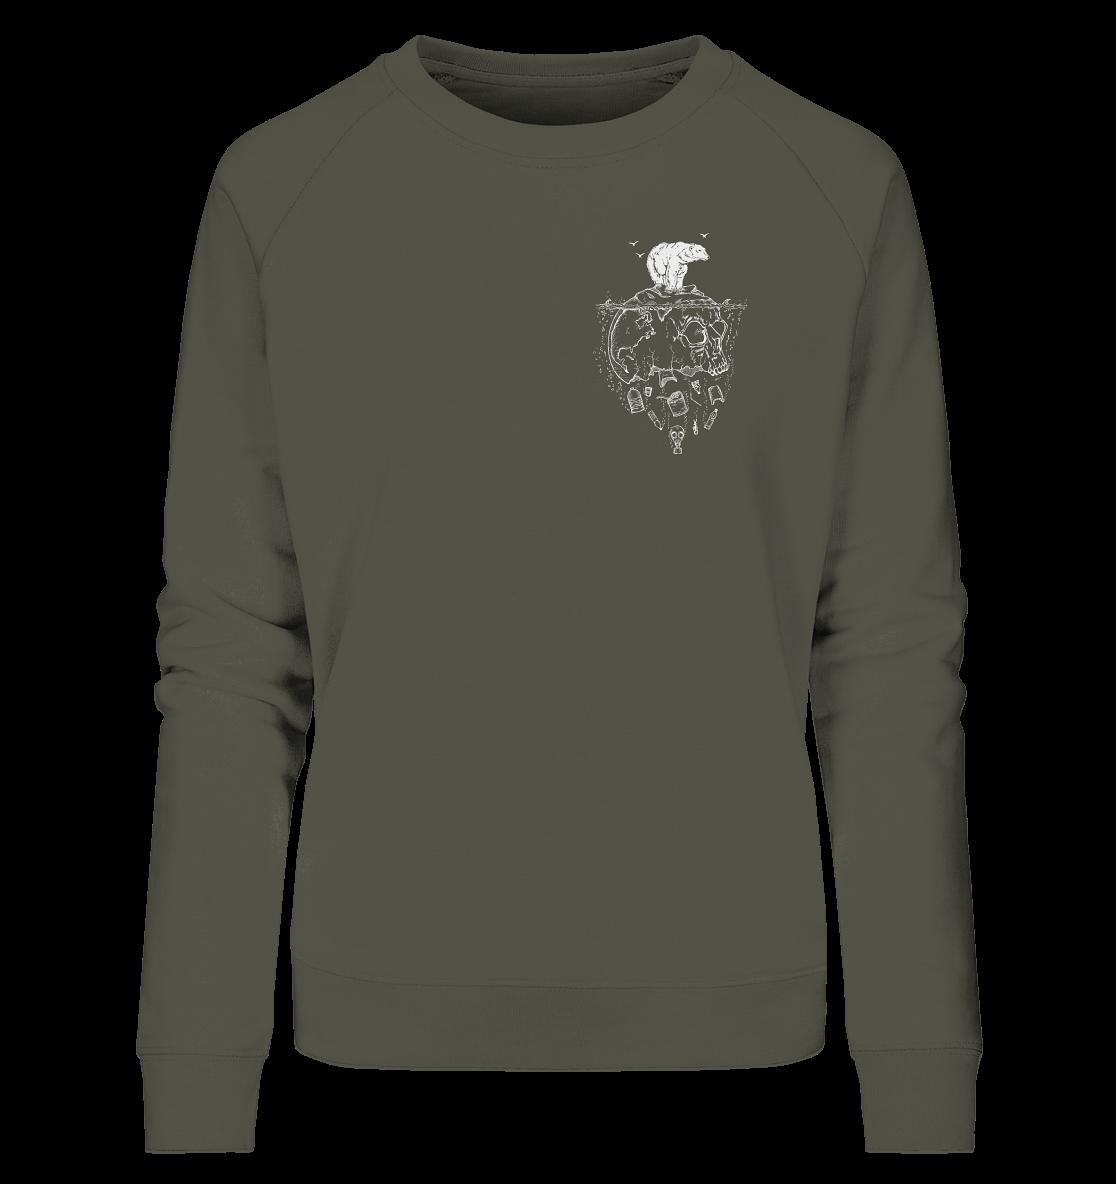 front-ladies-organic-sweatshirt-545348-1116x-16.png